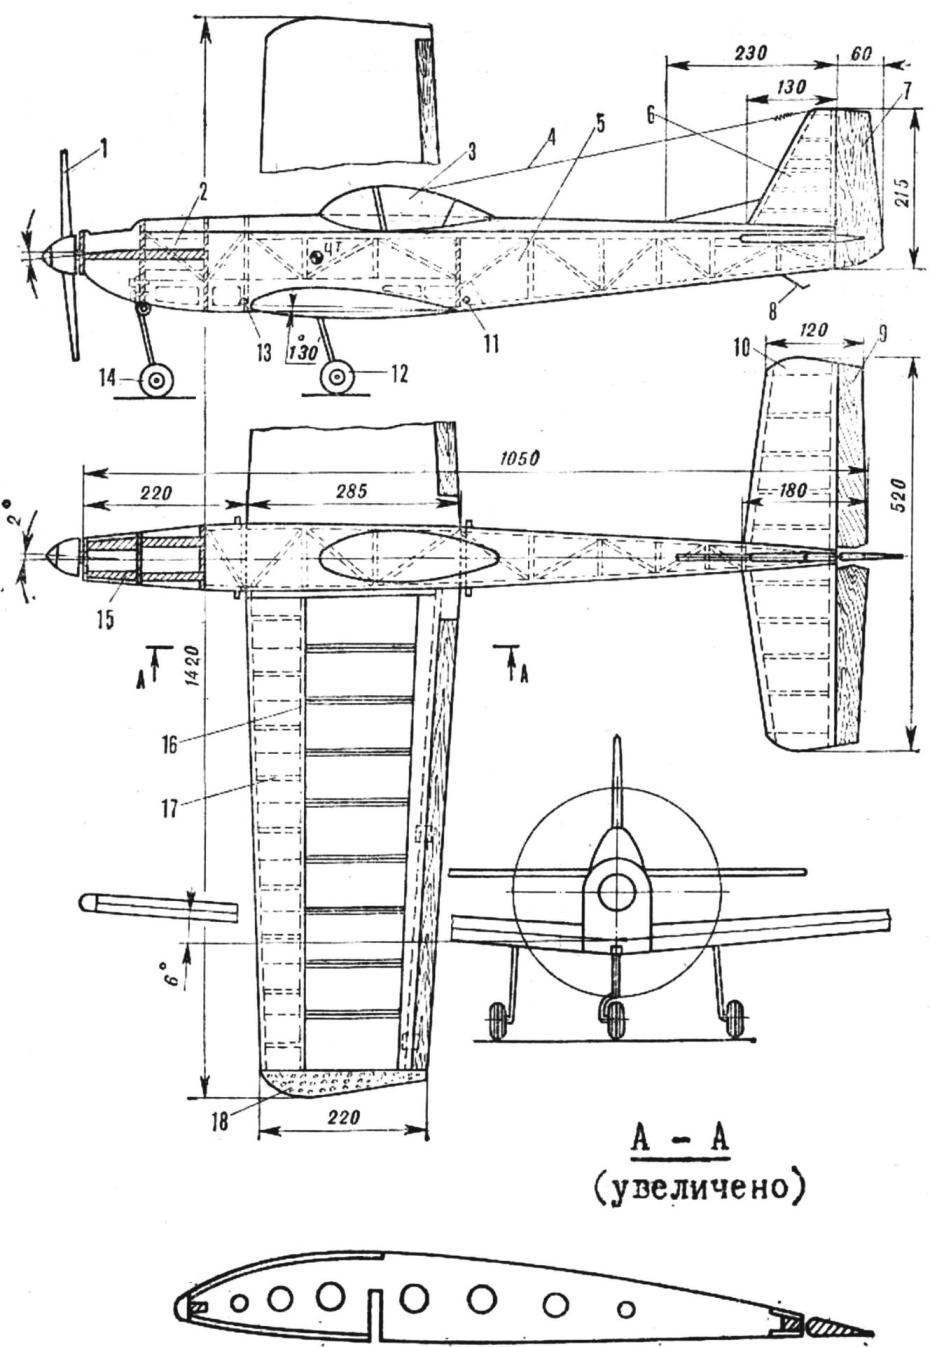 Рис. 1. Конструкция модели